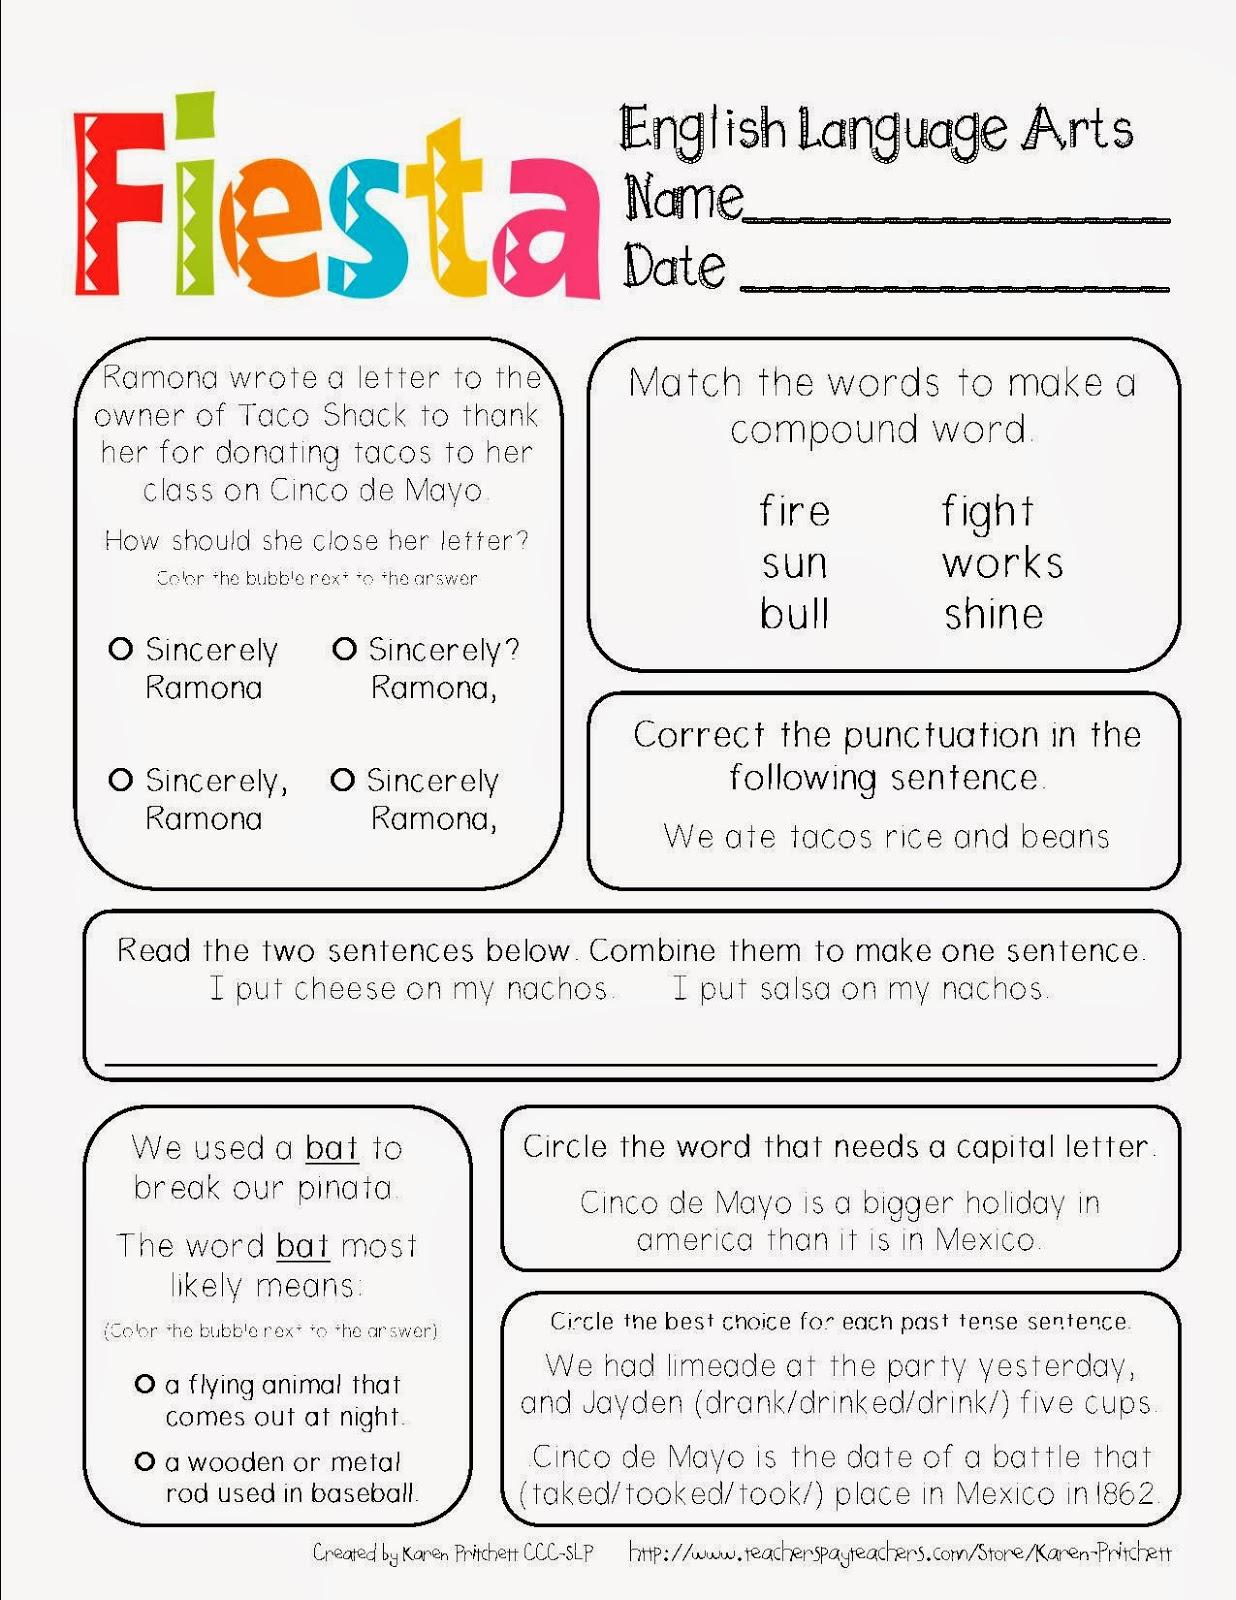 Mrs. Pritchett's Printables - Free Printable Snapwords